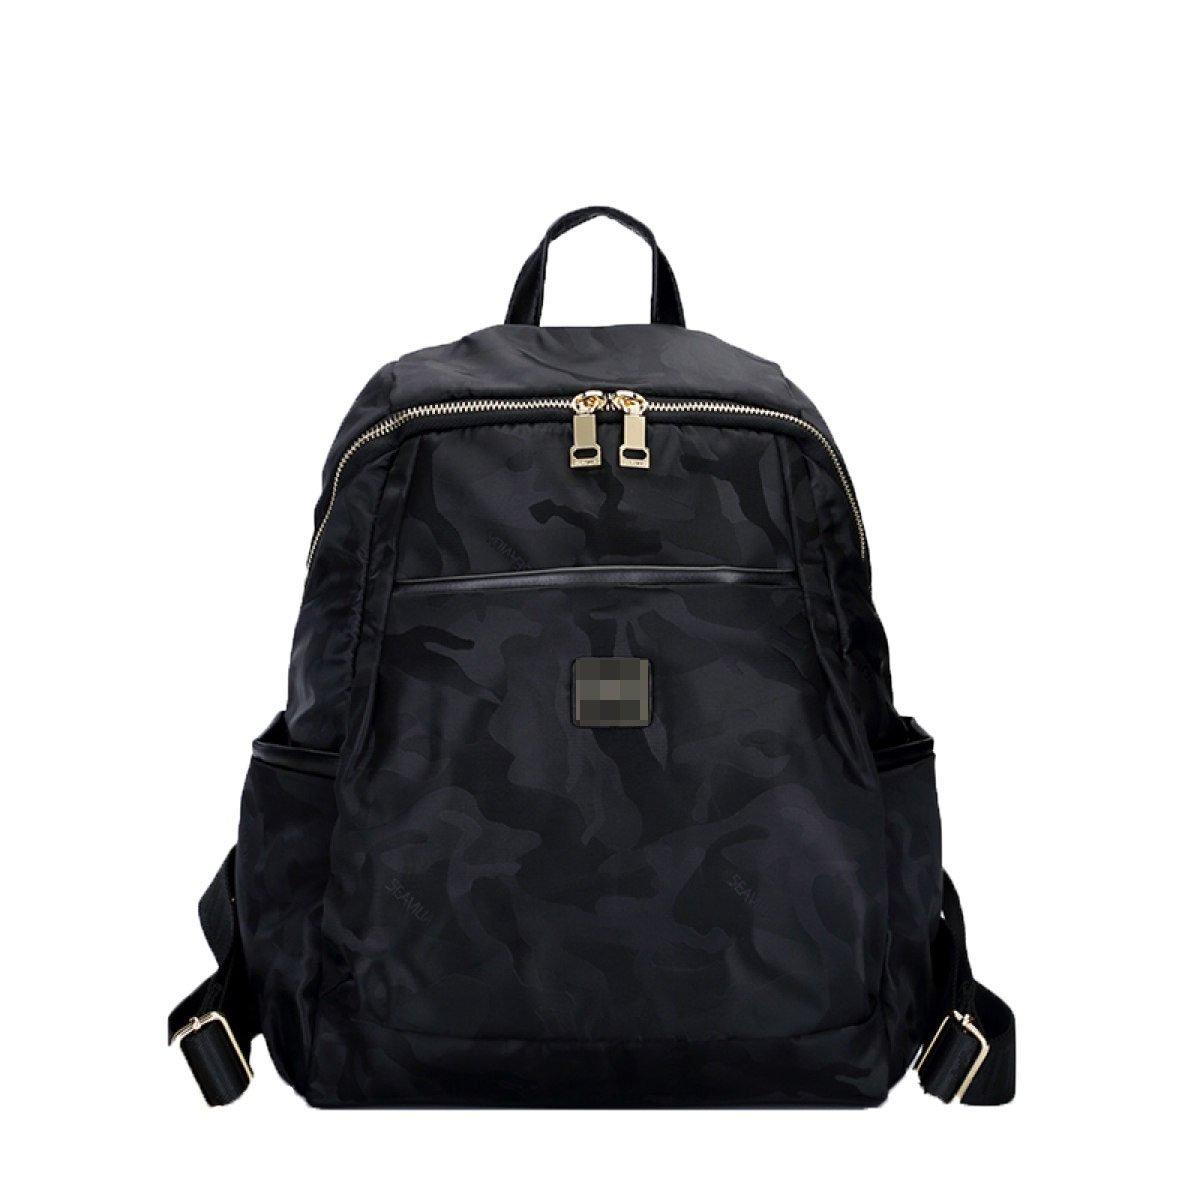 Black Medium Camouflage Nylon Backpack Waterproof Travel Gear Bag Business Trip Computer Daypack